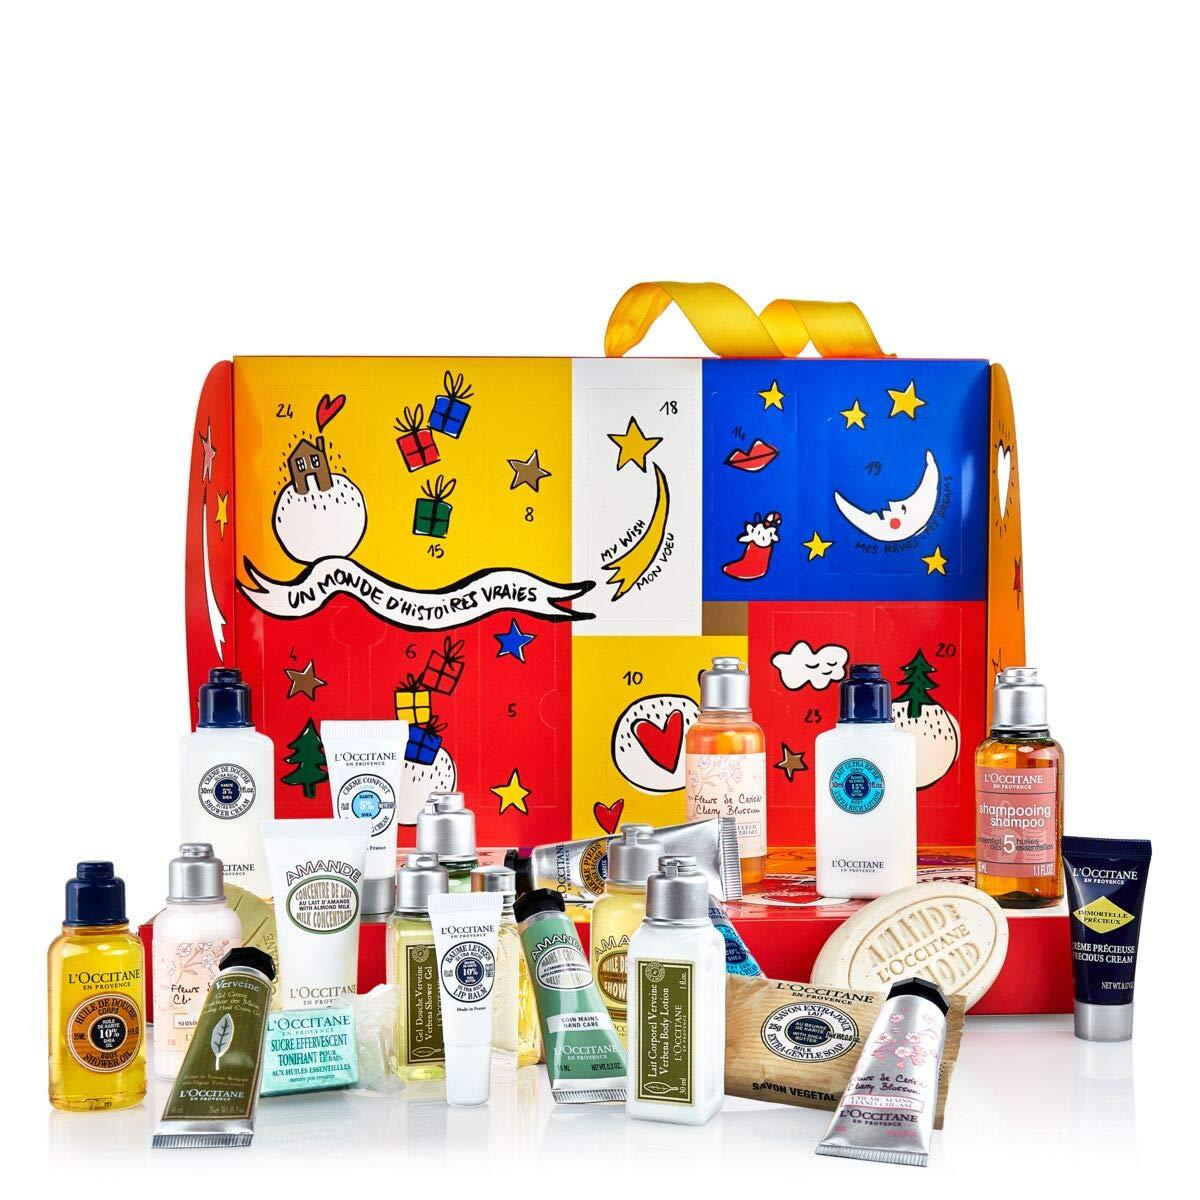 L\\\'Occitane Advent Calendar 2020 Amazon.com: L'Occitane Signature Advent Calendar: Beauty